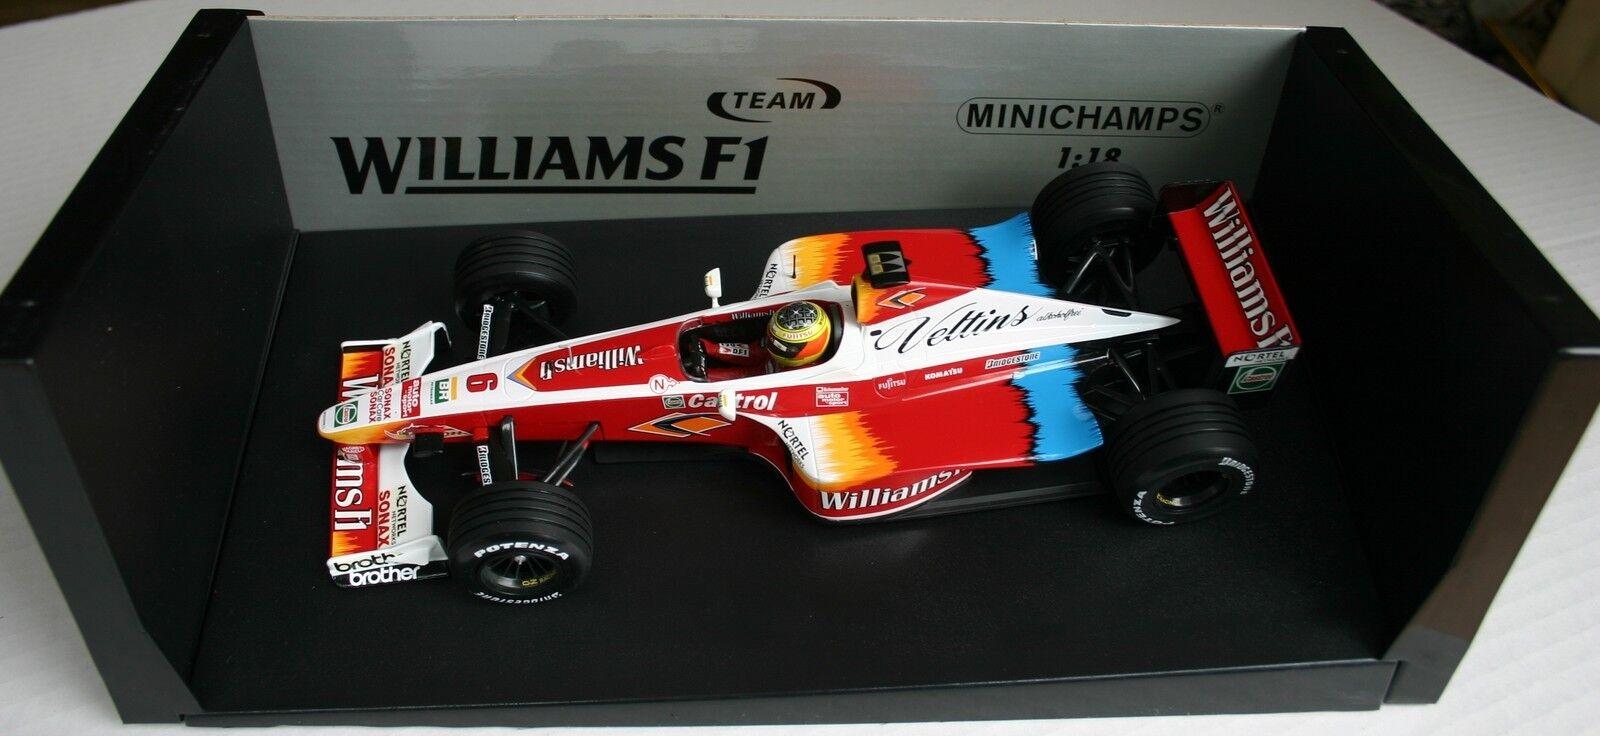 1 18 WILLIAMS FW21 RALF SCHUMACHER 1999 F1 VELTINS MINICHAMPS DISPLAY BOX